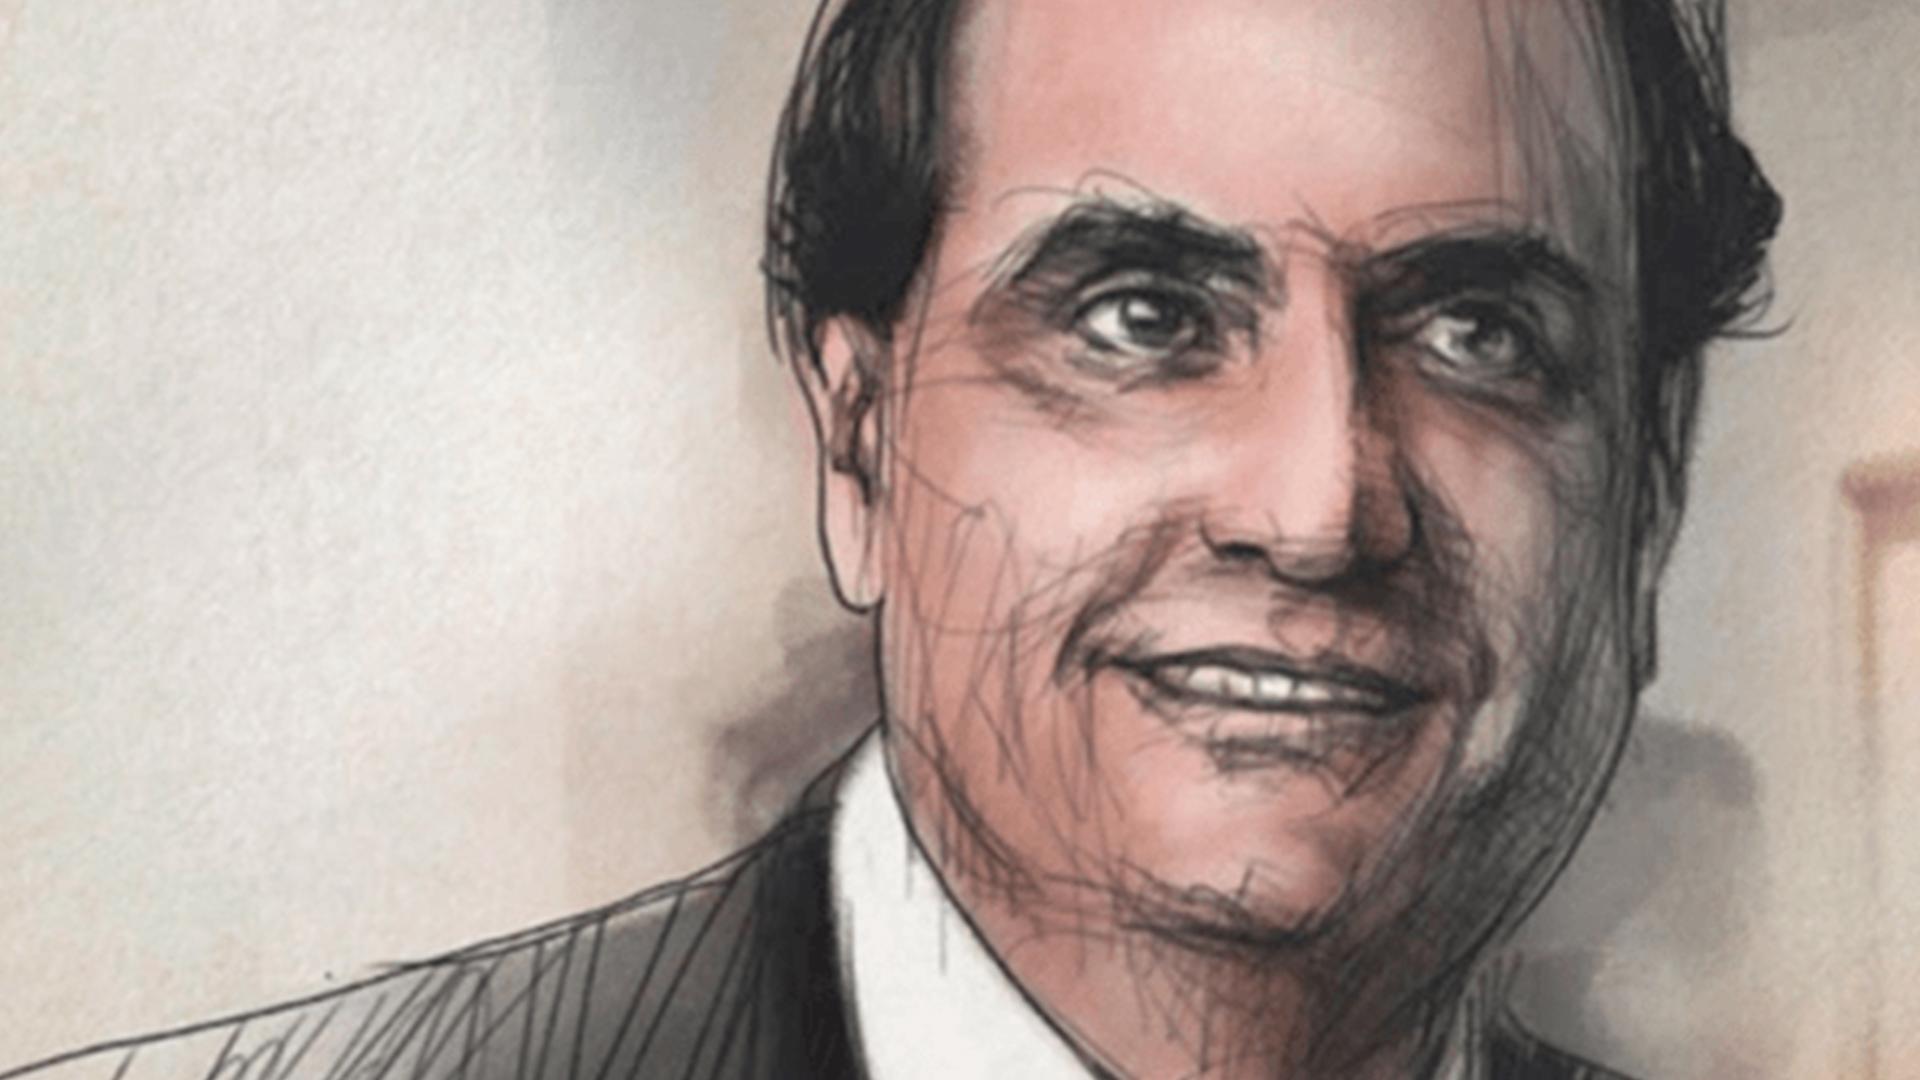 Tribunal de Cabo Verde otorgó arresto domiciliario a Alex Saab